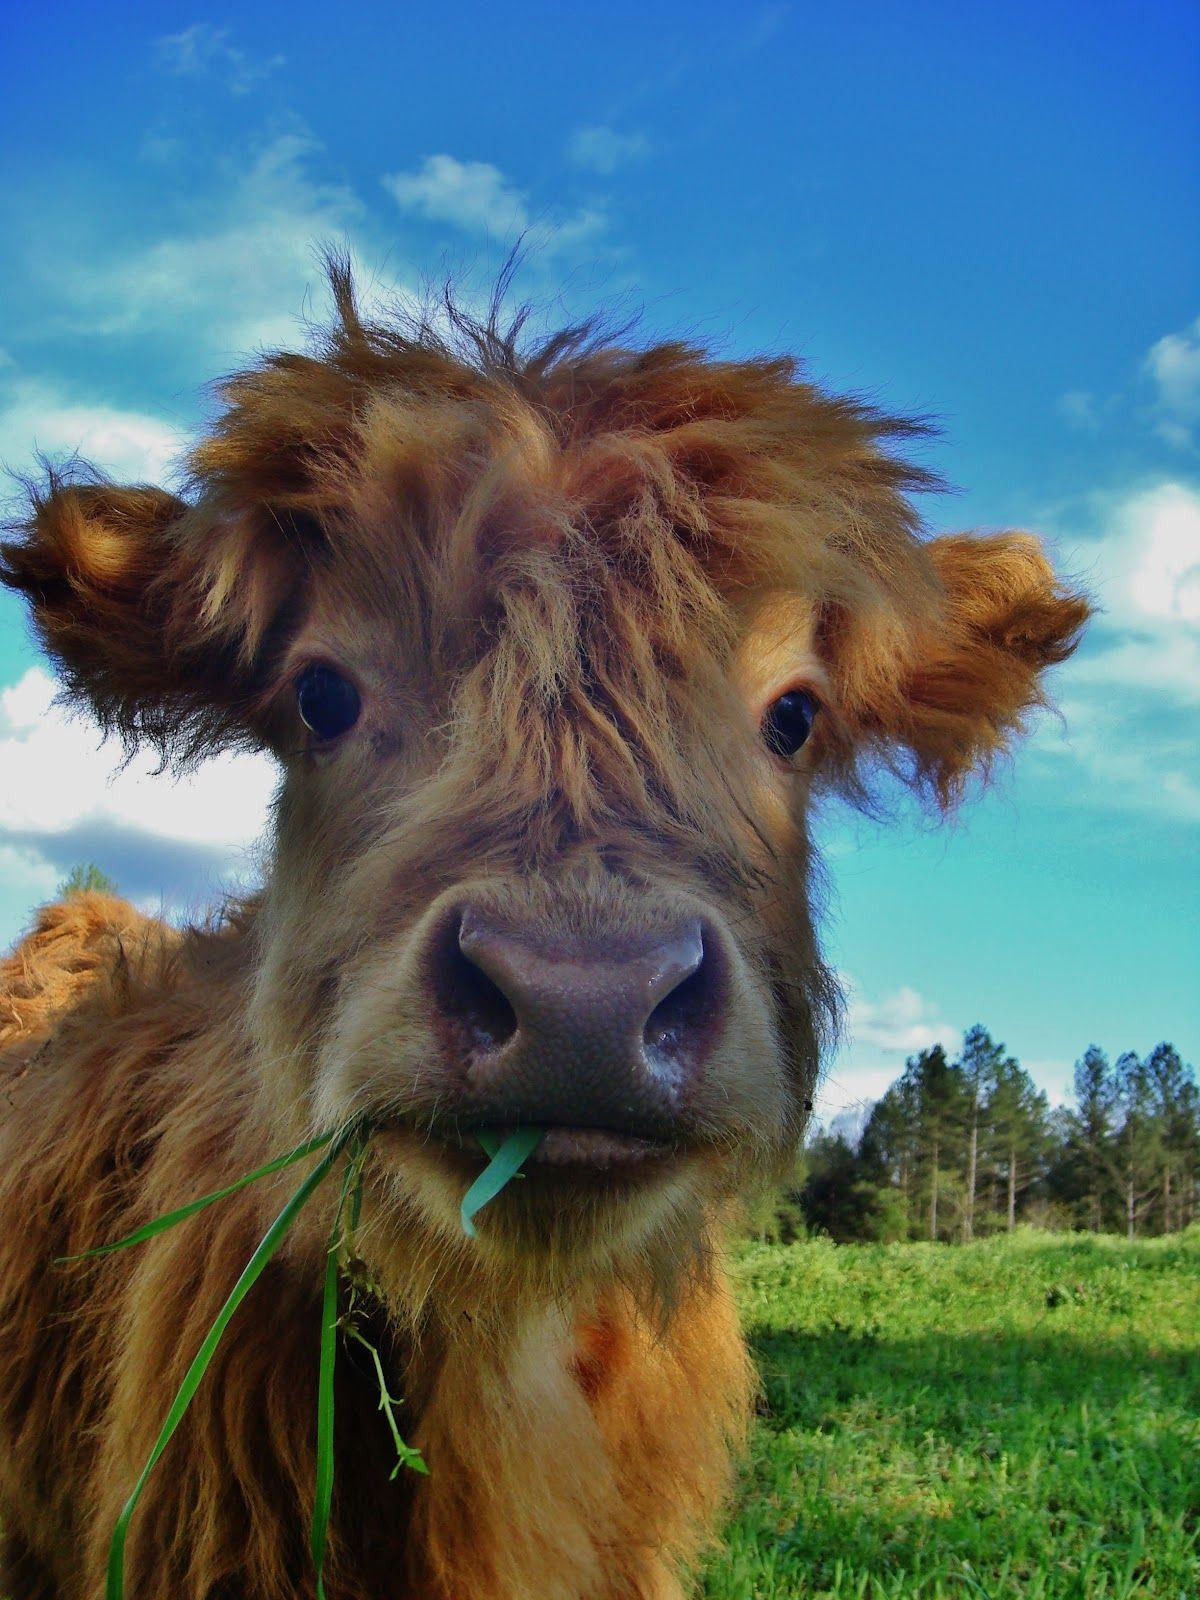 Dsc00247 Jpg 1 200 1 600 Pixels Animal Wallpaper Fluffy Cows Farm Animals